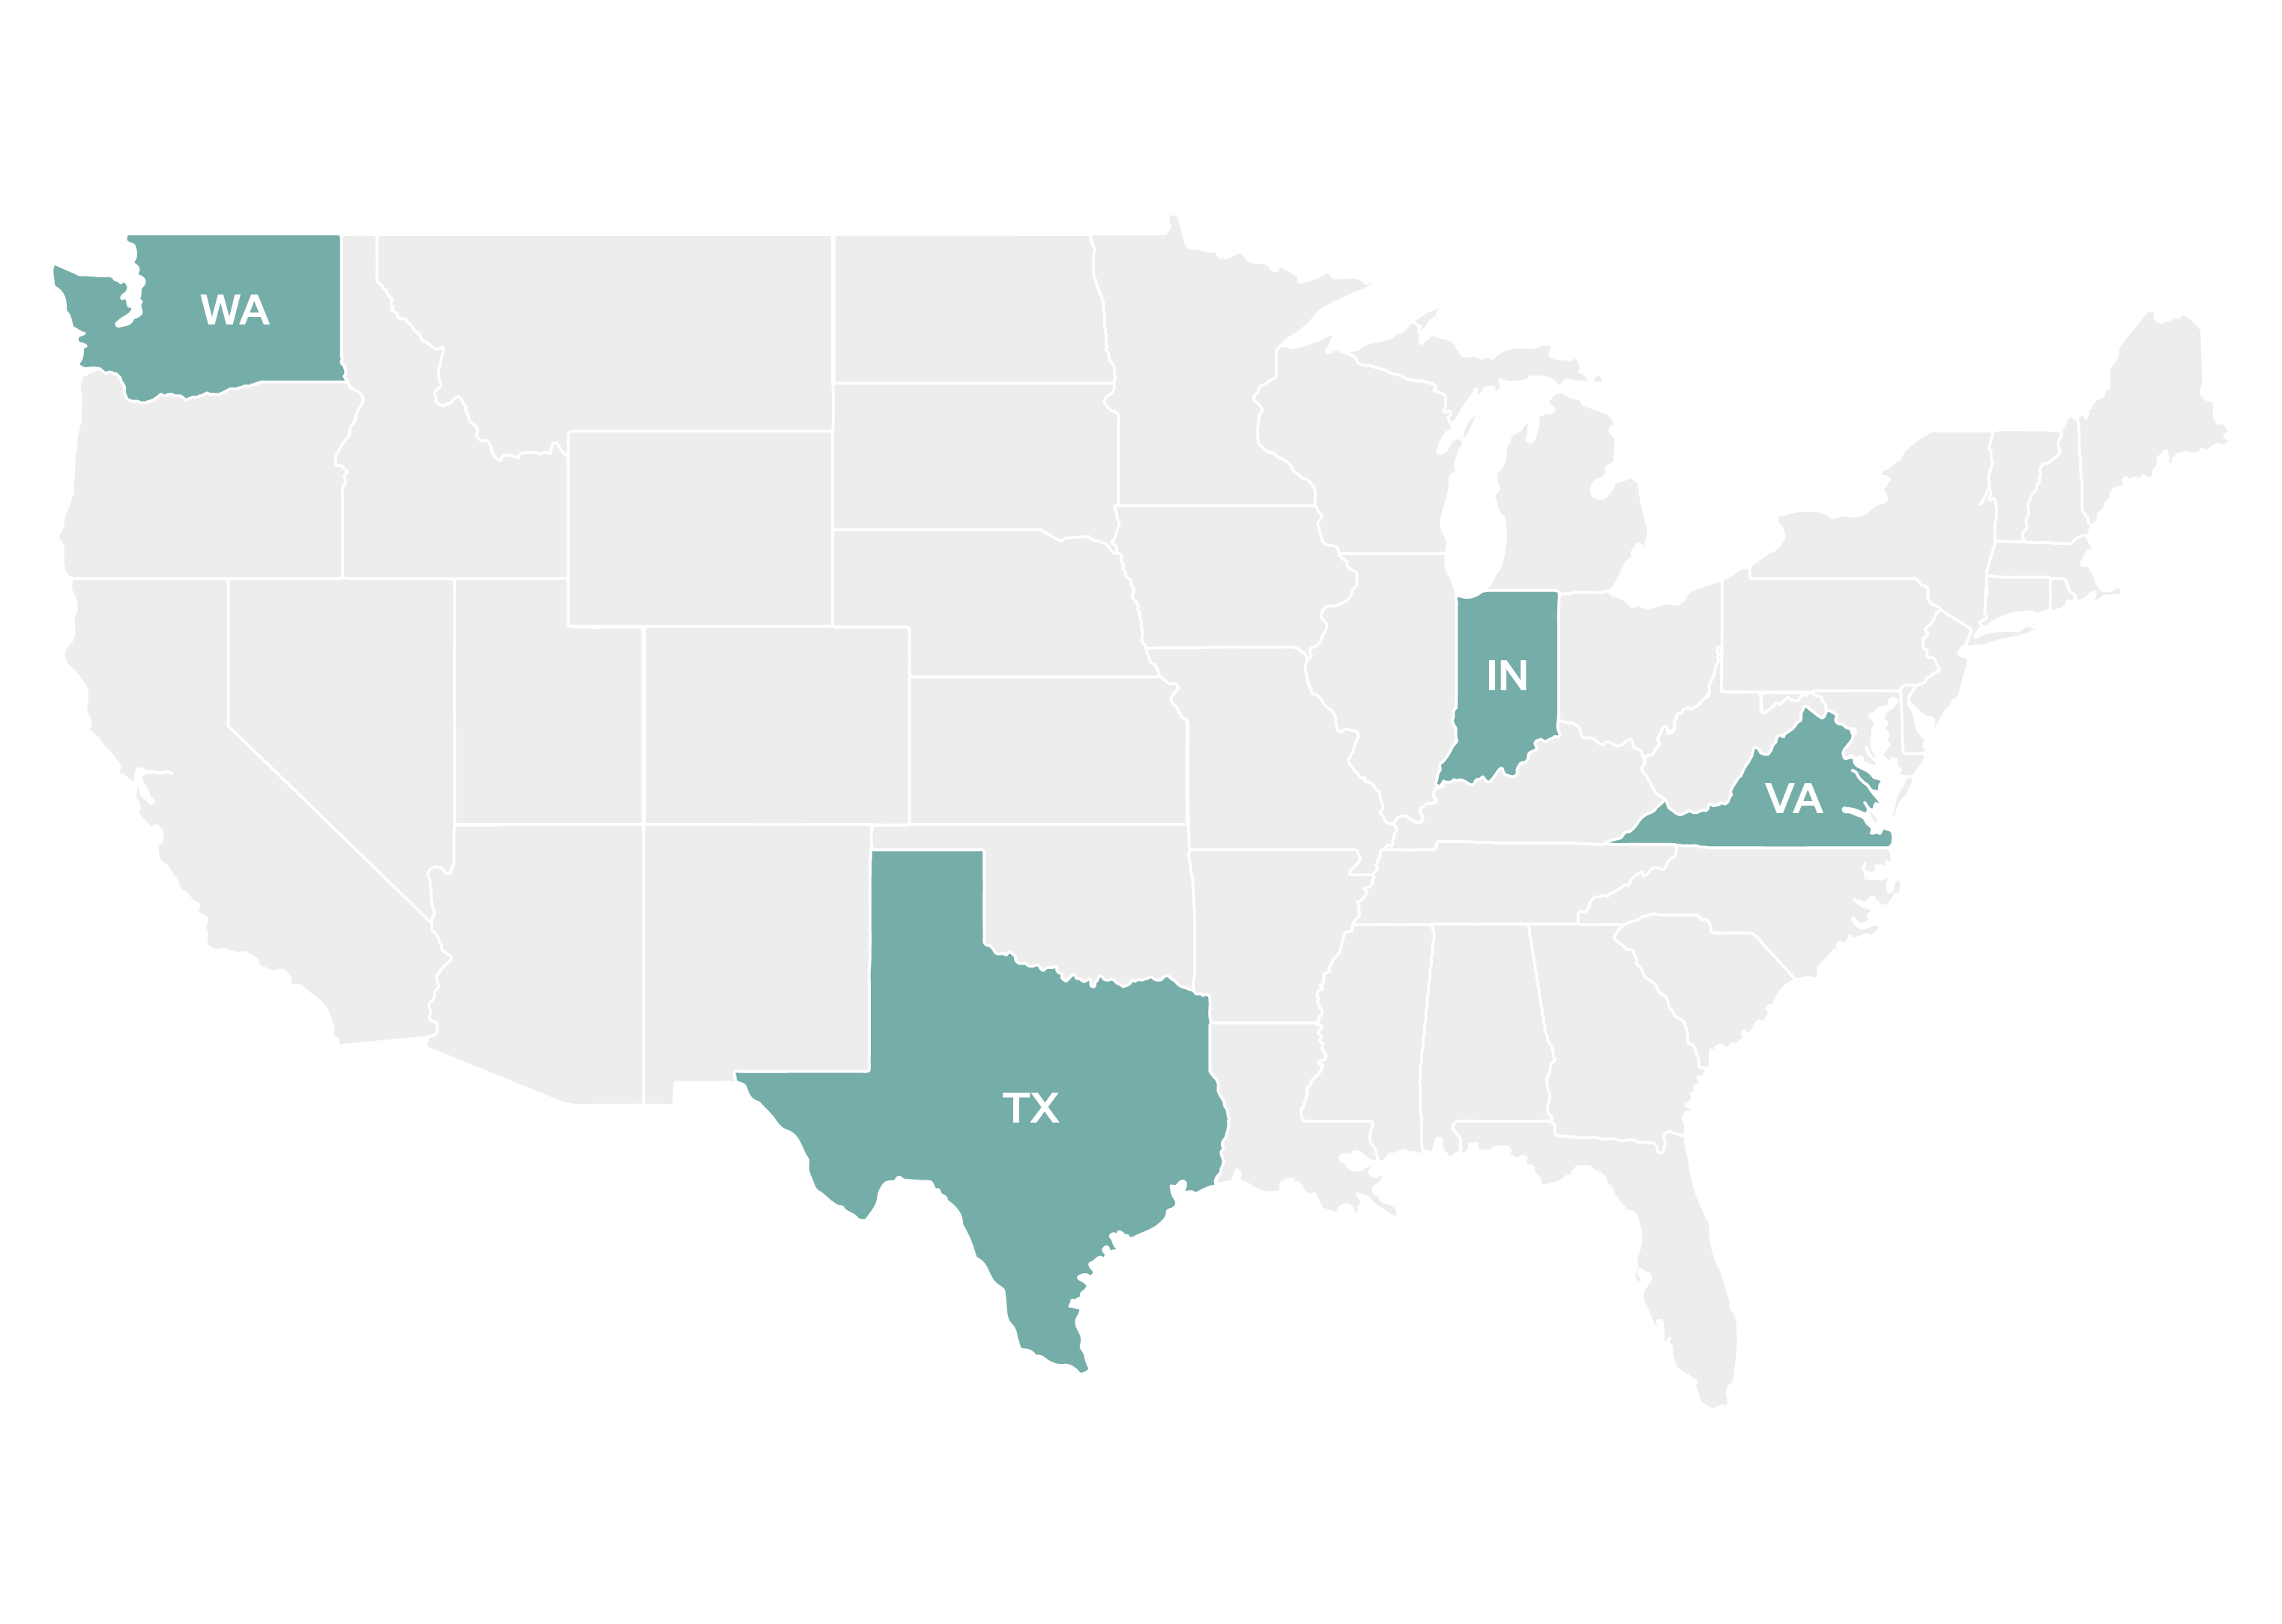 A map highlighting Washington, Texas, Indiana, and Virginia